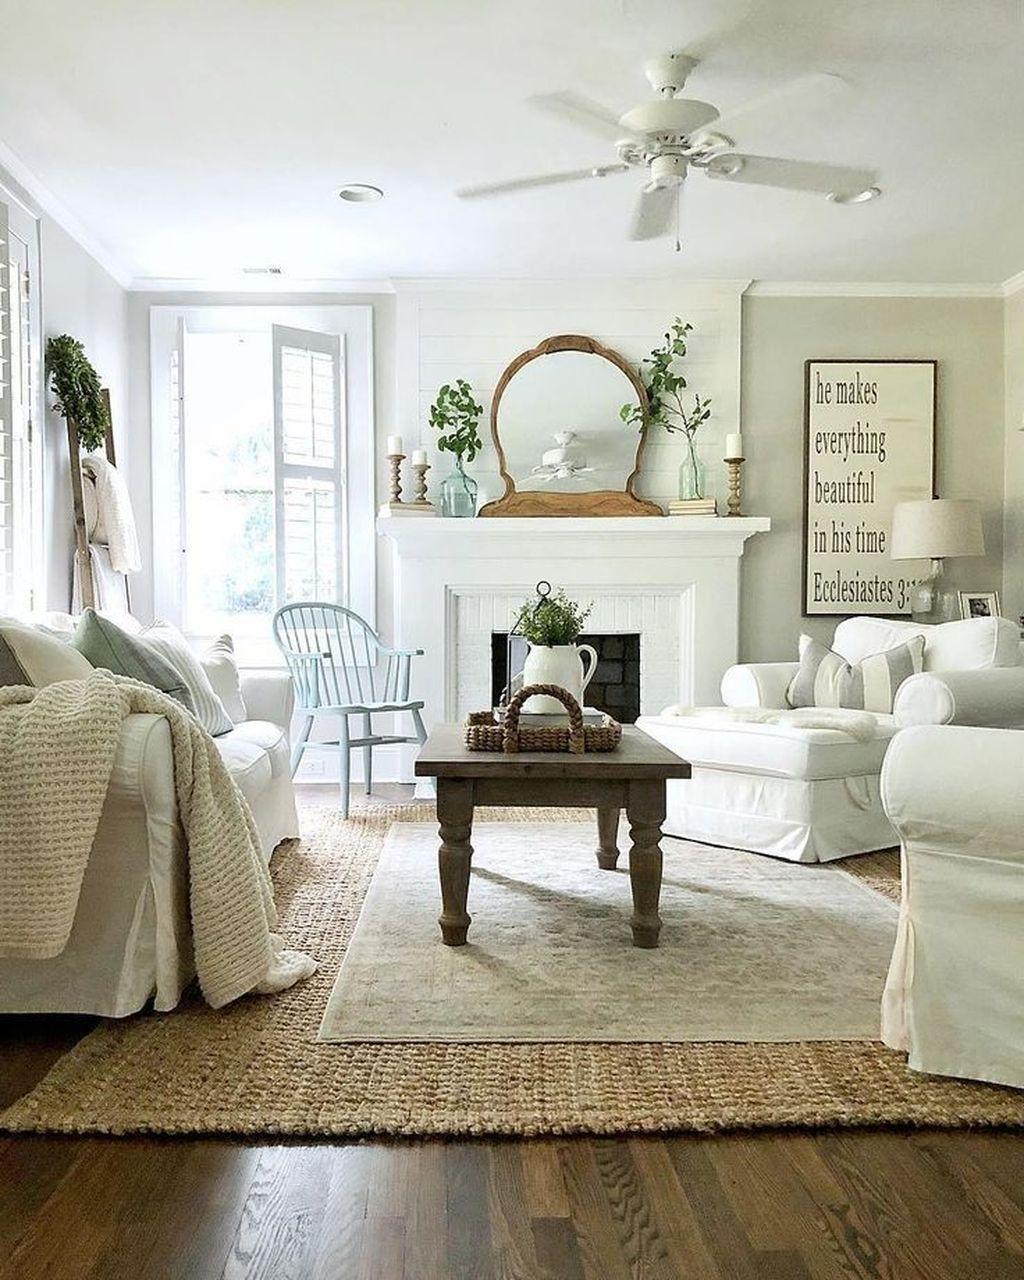 Incredible Rustic Farmhouse Living Room Design Ideas 16